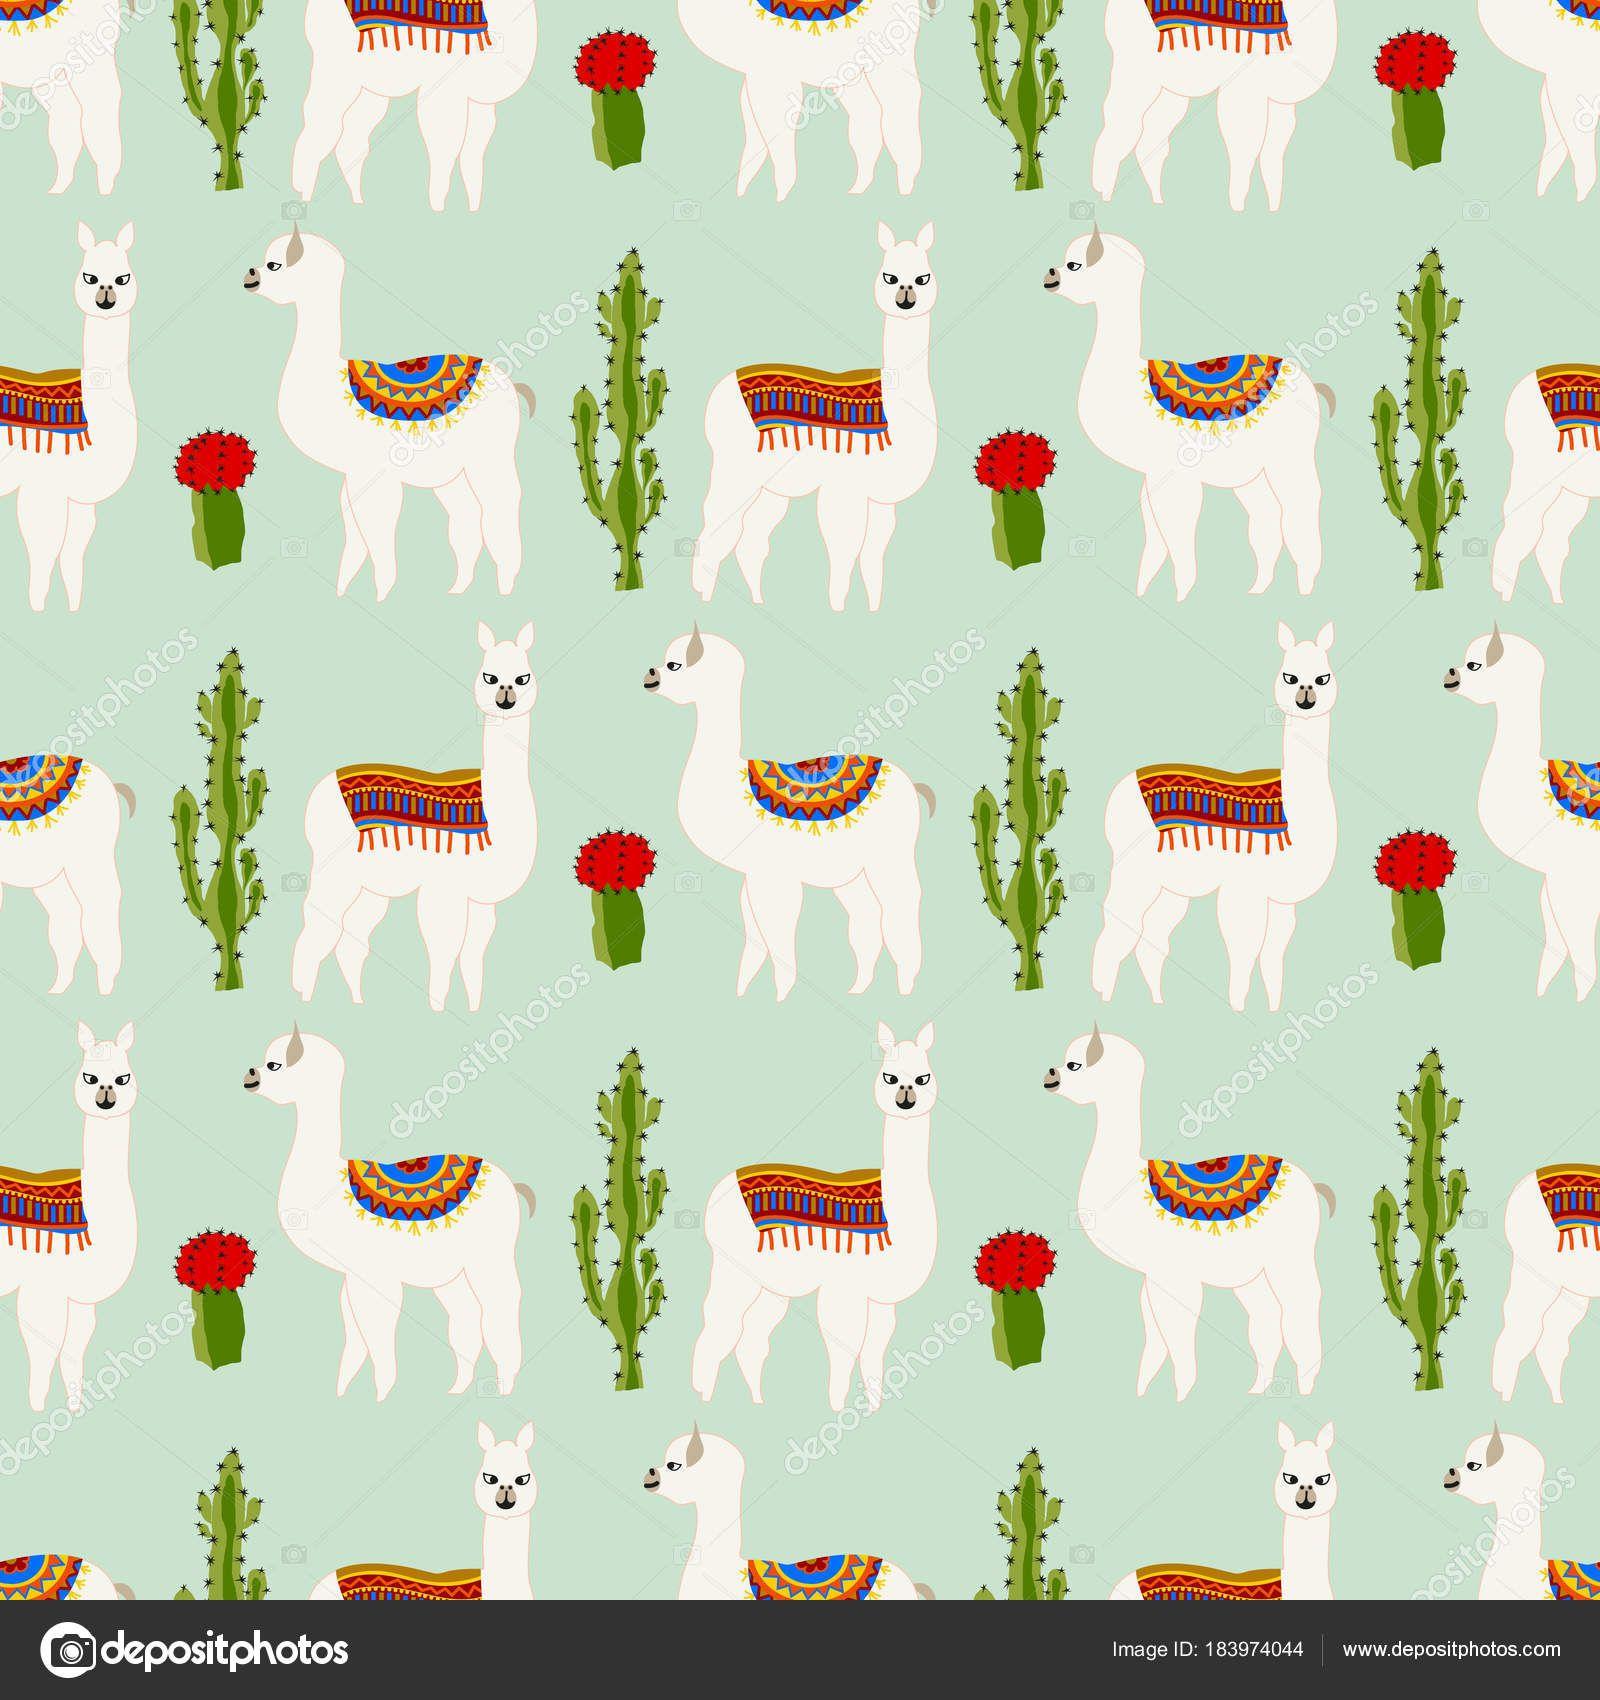 Llama Wallpaper: Image Result For Mexican Llama Wallpaper Drawings